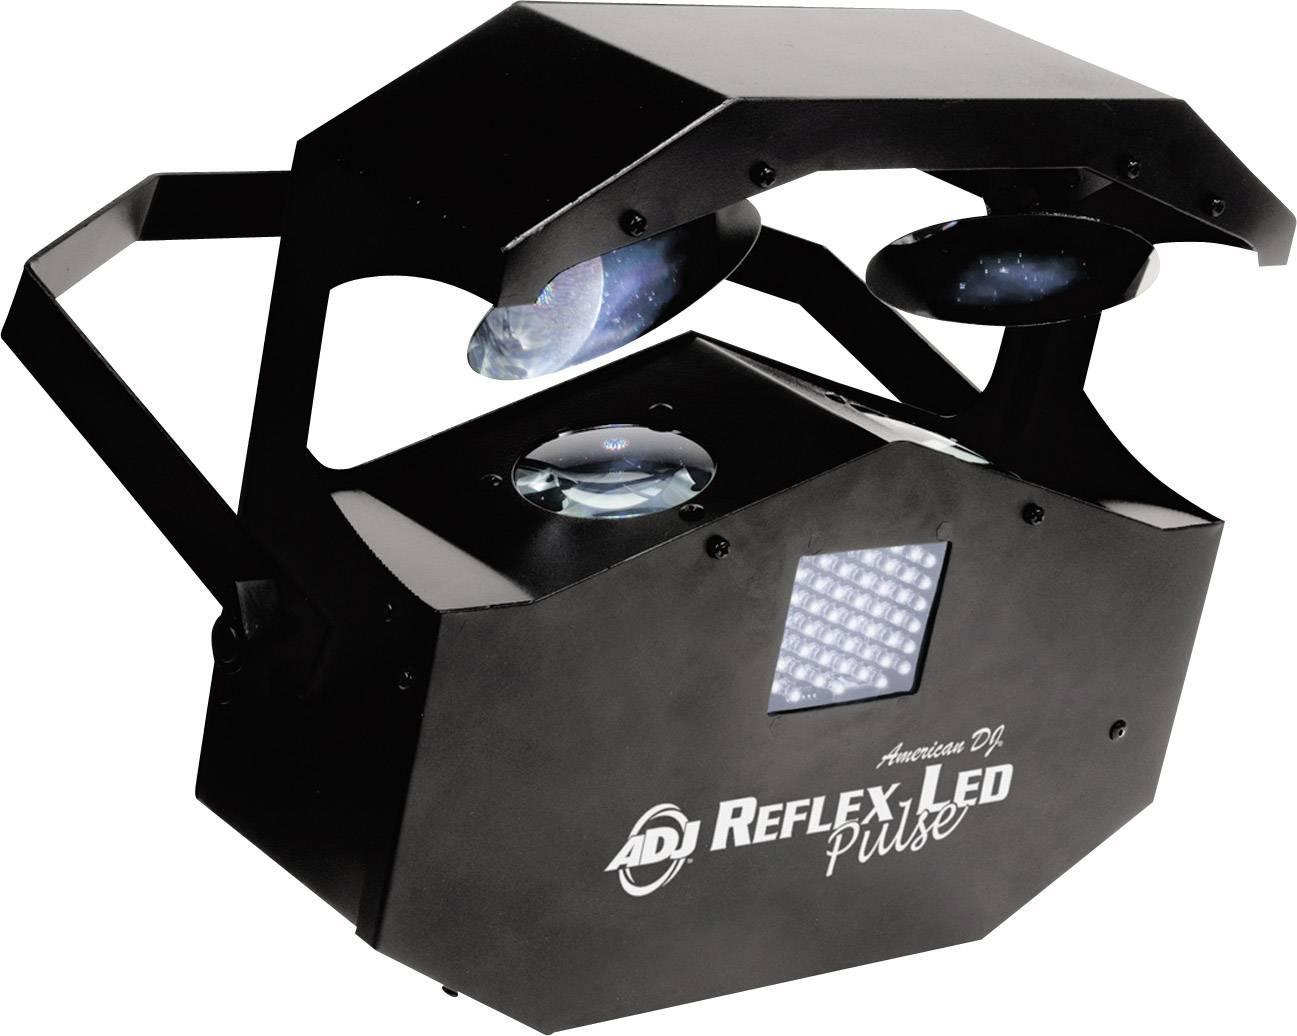 Efektový LED reflektor ADJ Reflex Pulse